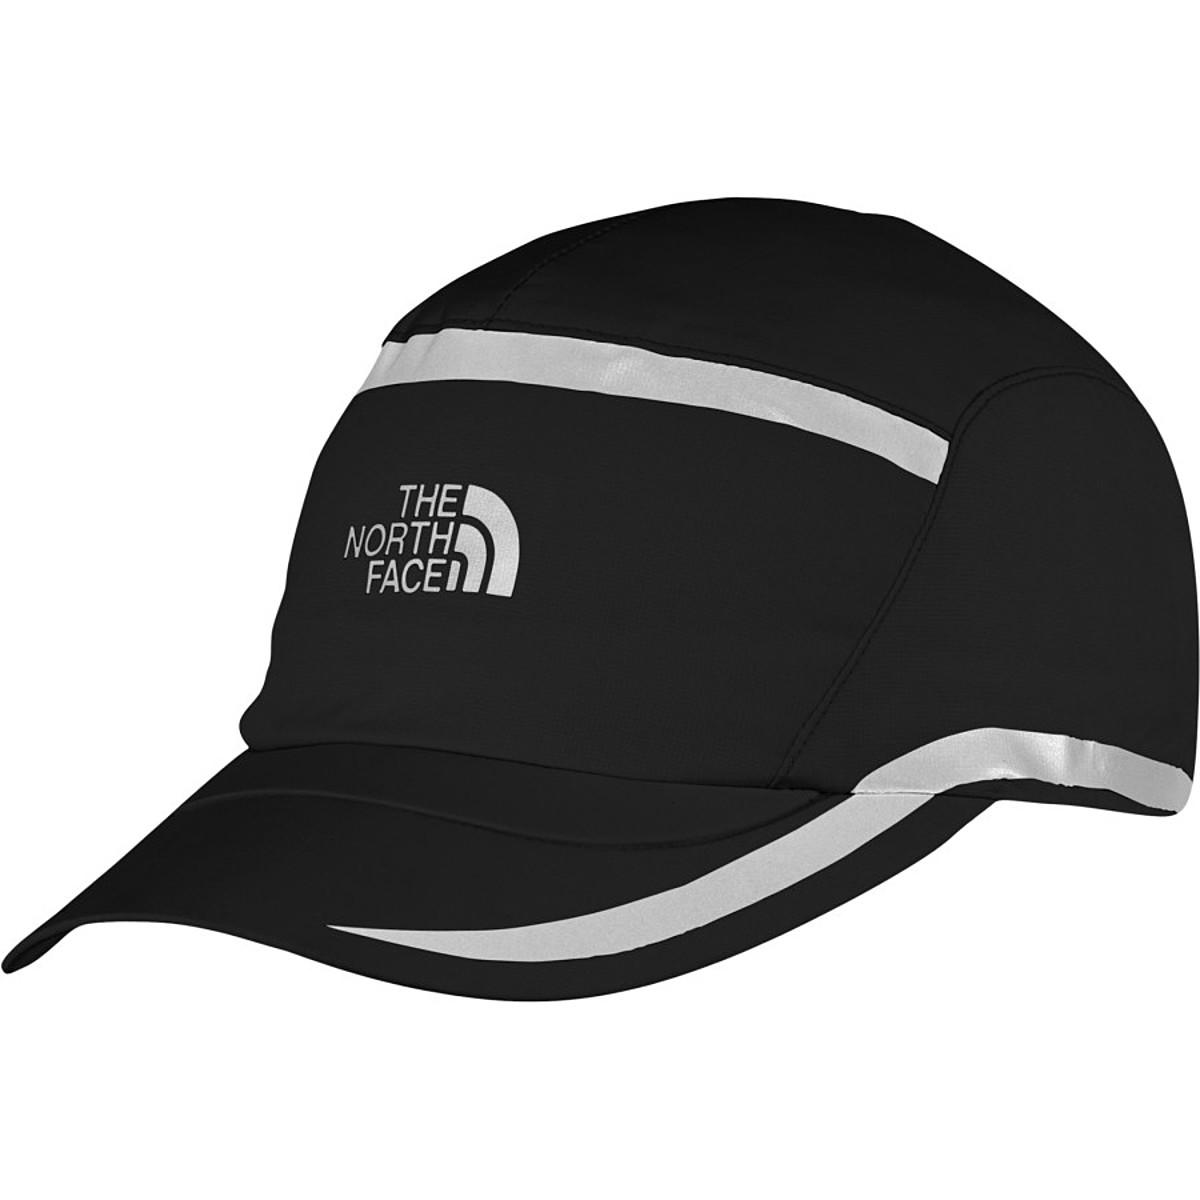 The North Face Illuminated Hat